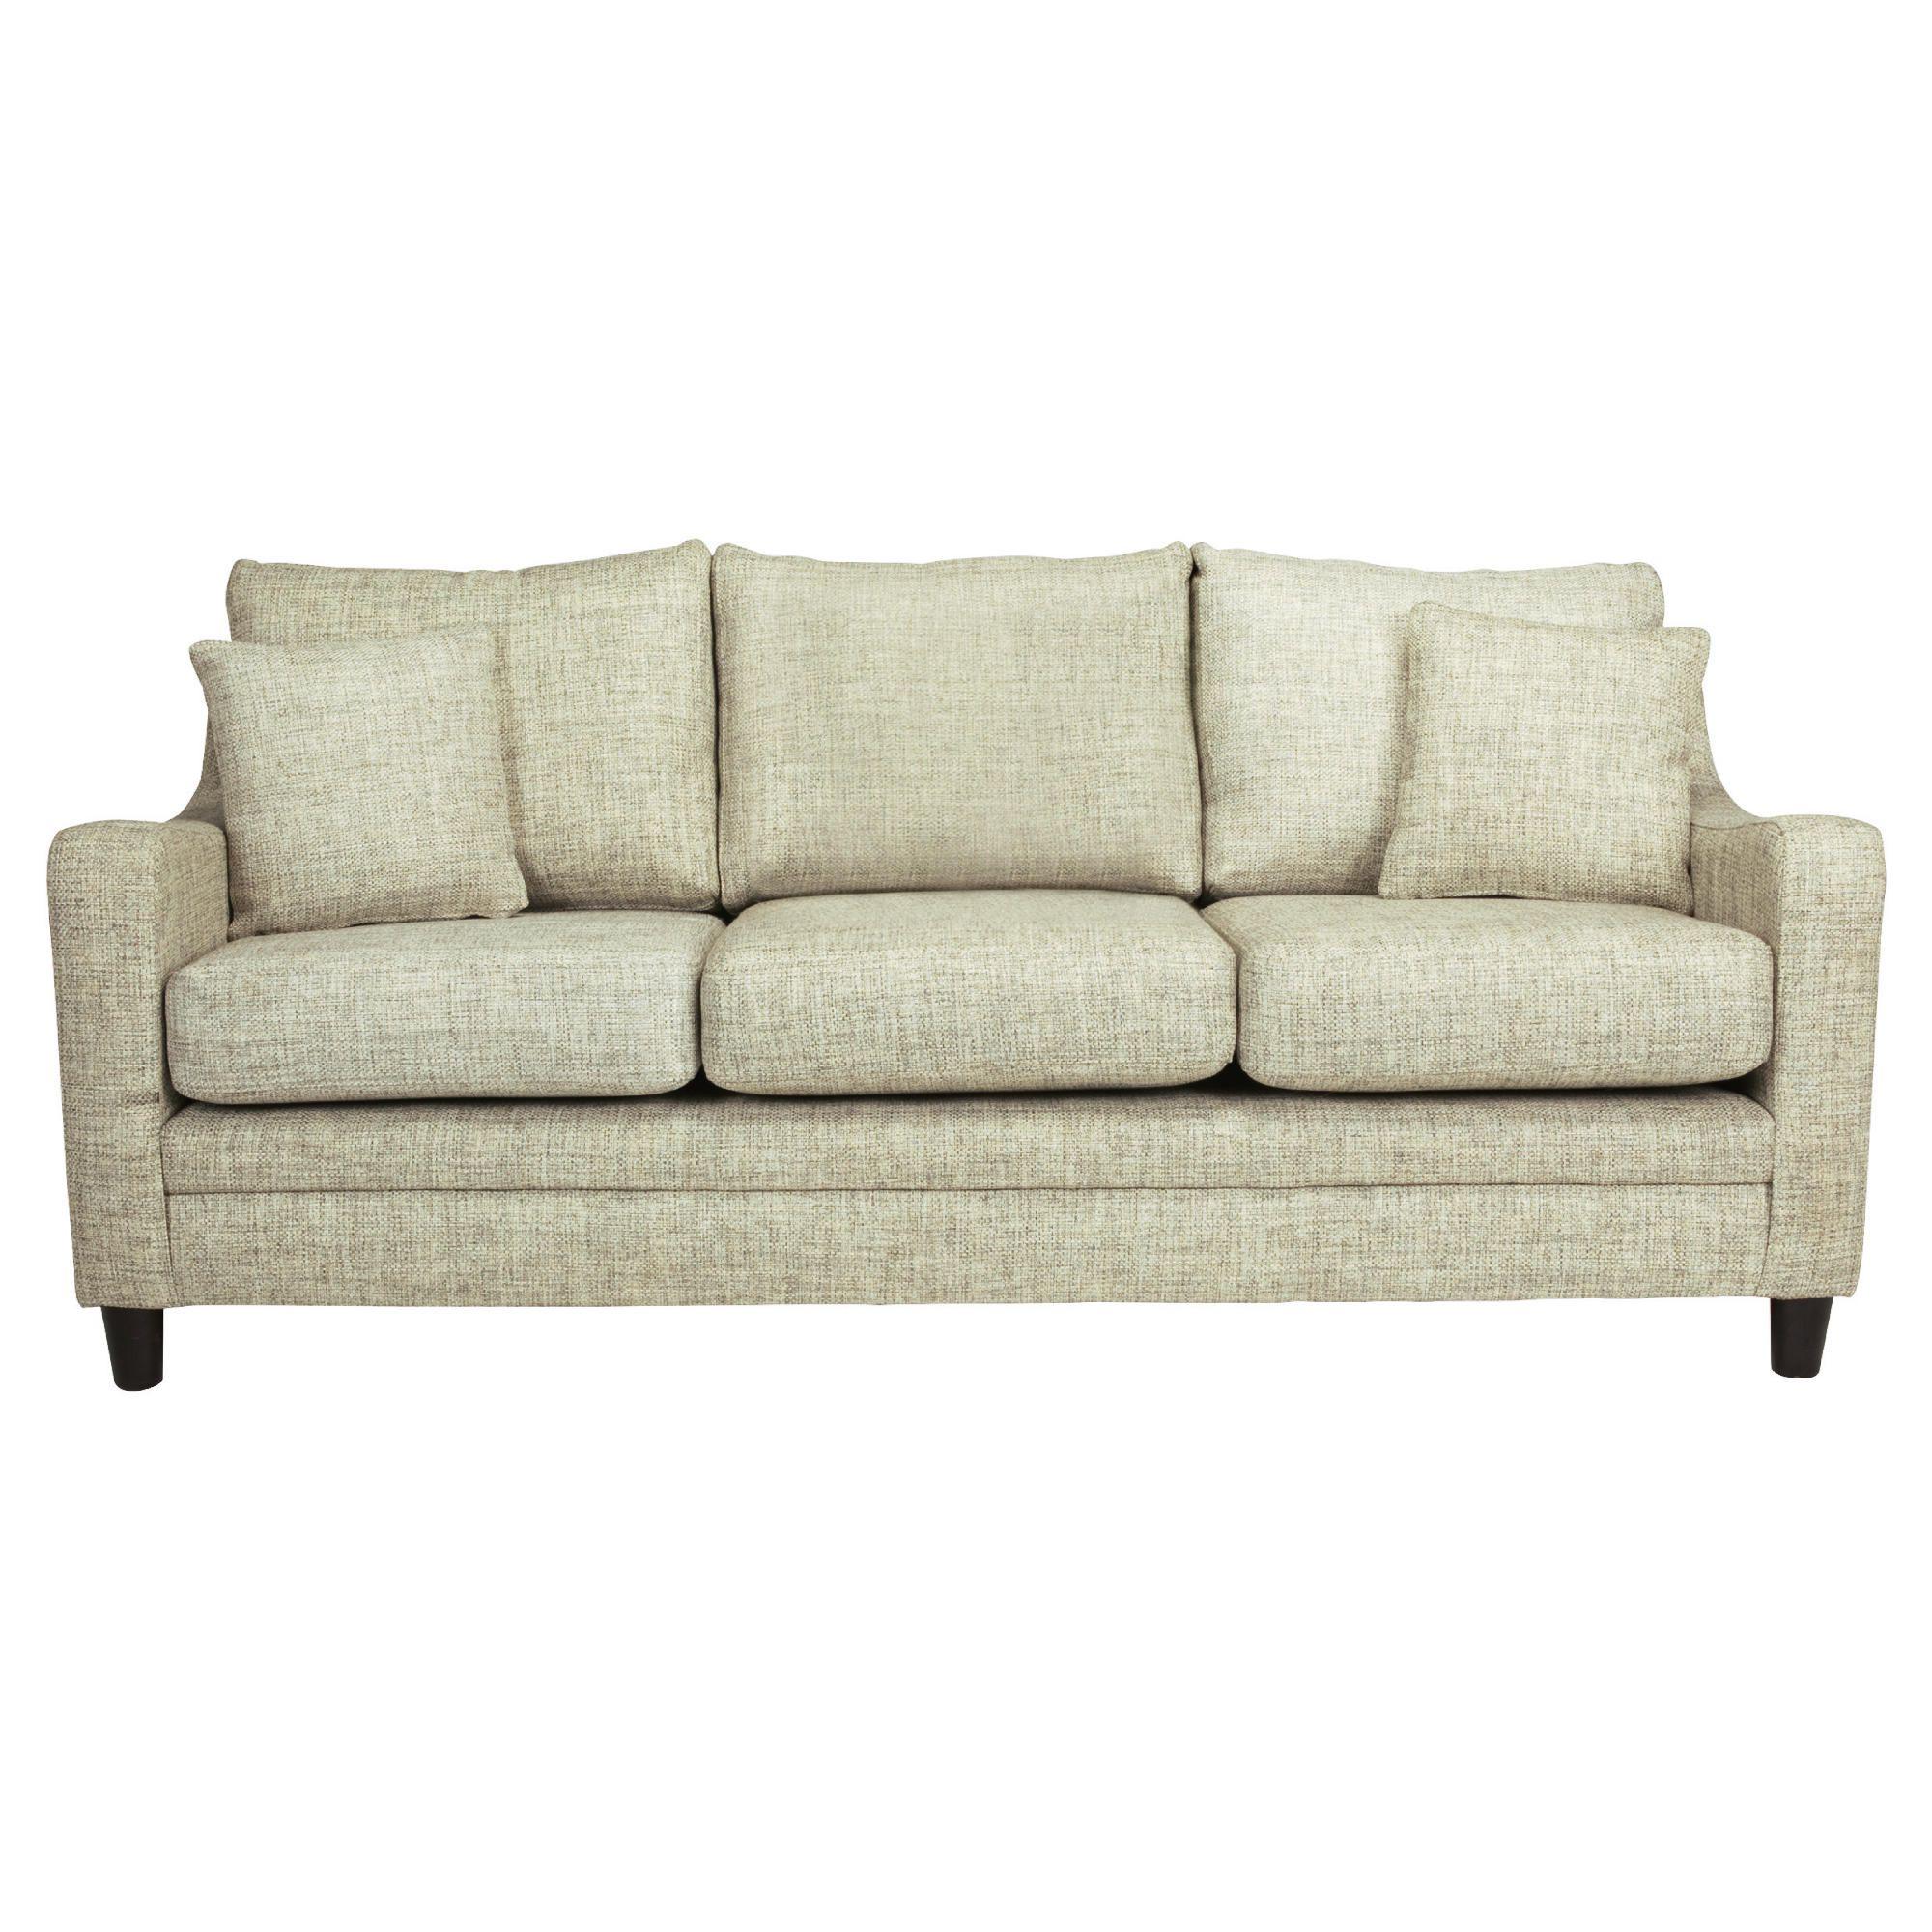 Tesco colorado leather sofa bed refil sofa for Sofa bed tesco